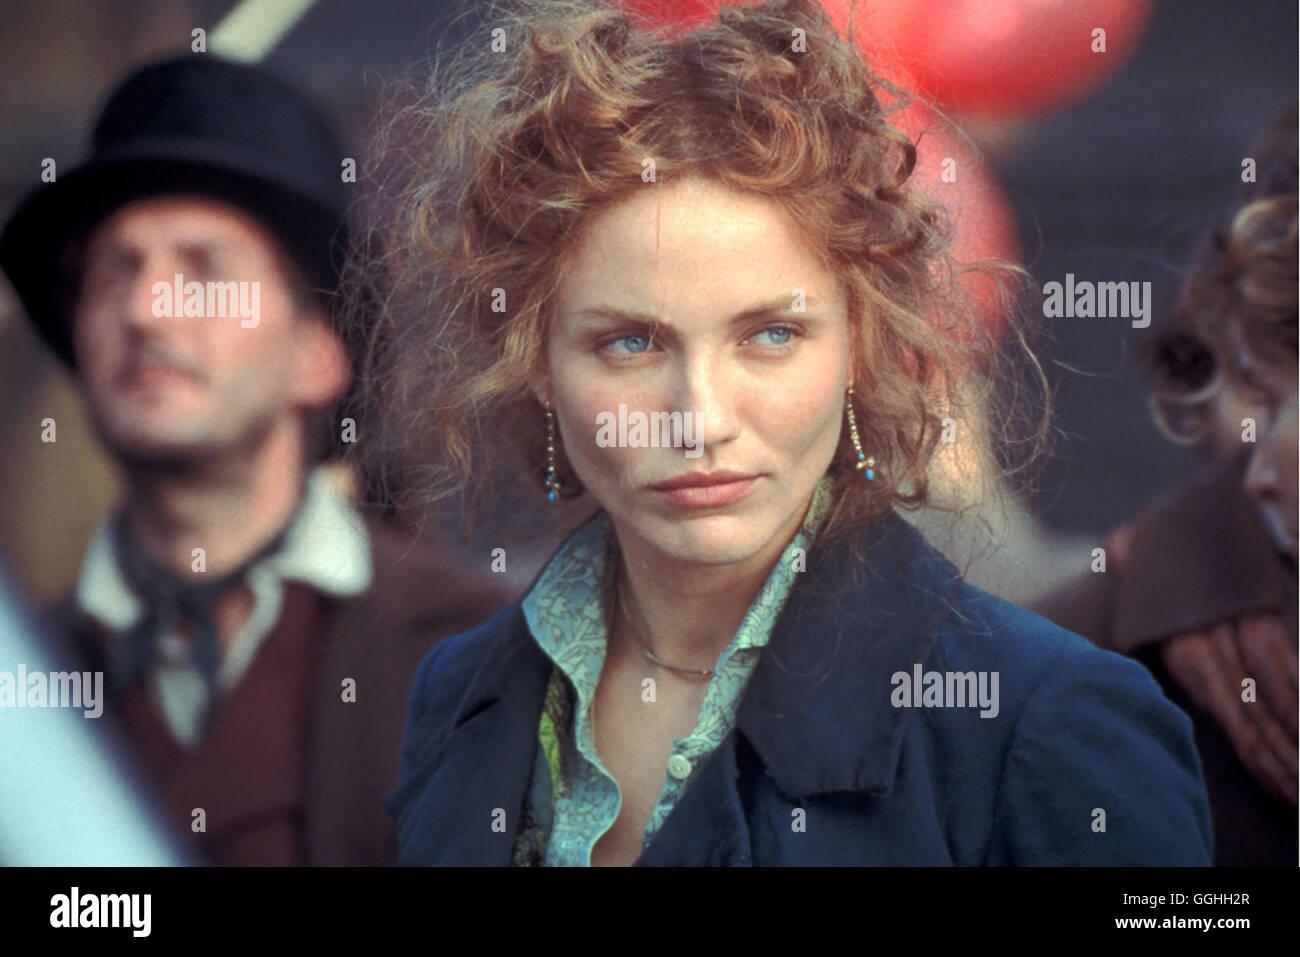 Gangs Of New York Gangs Of New York Usa Martin Scorsese Stock Photo Royalty Free Image